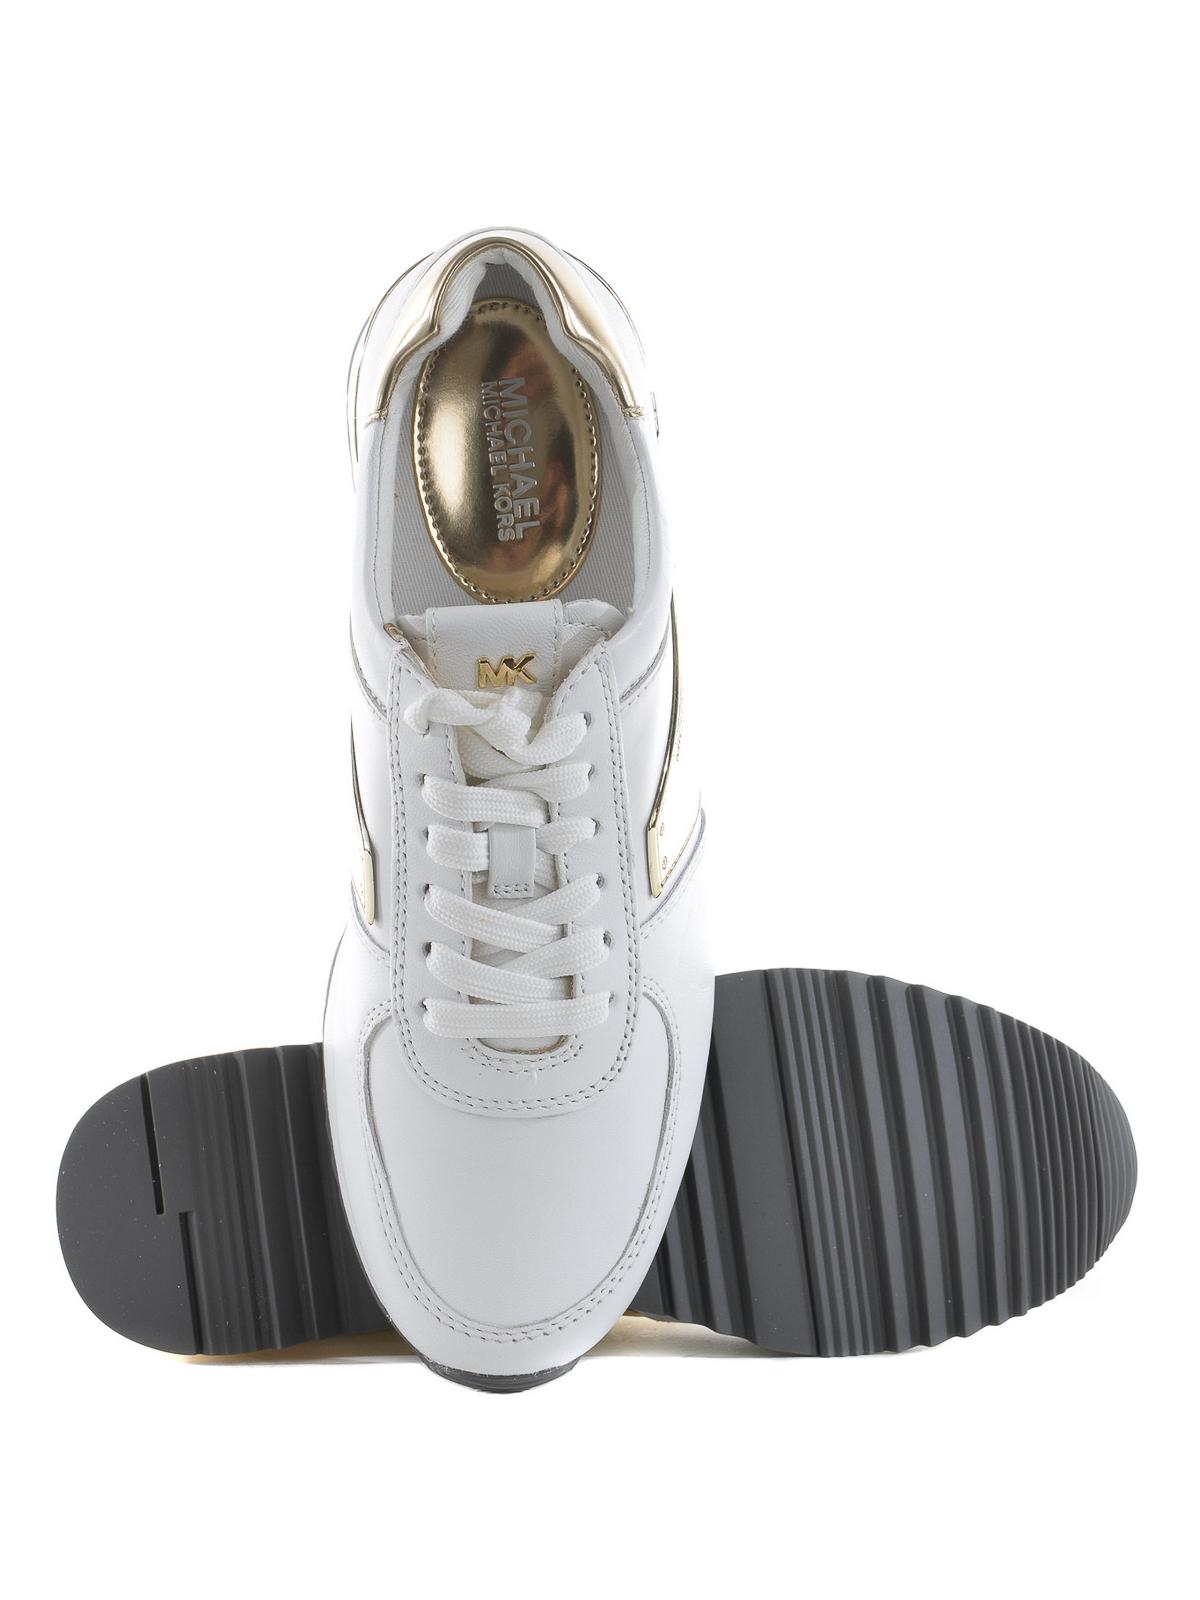 Michael Kors Sneaker Fur Damen Weiß Sneaker